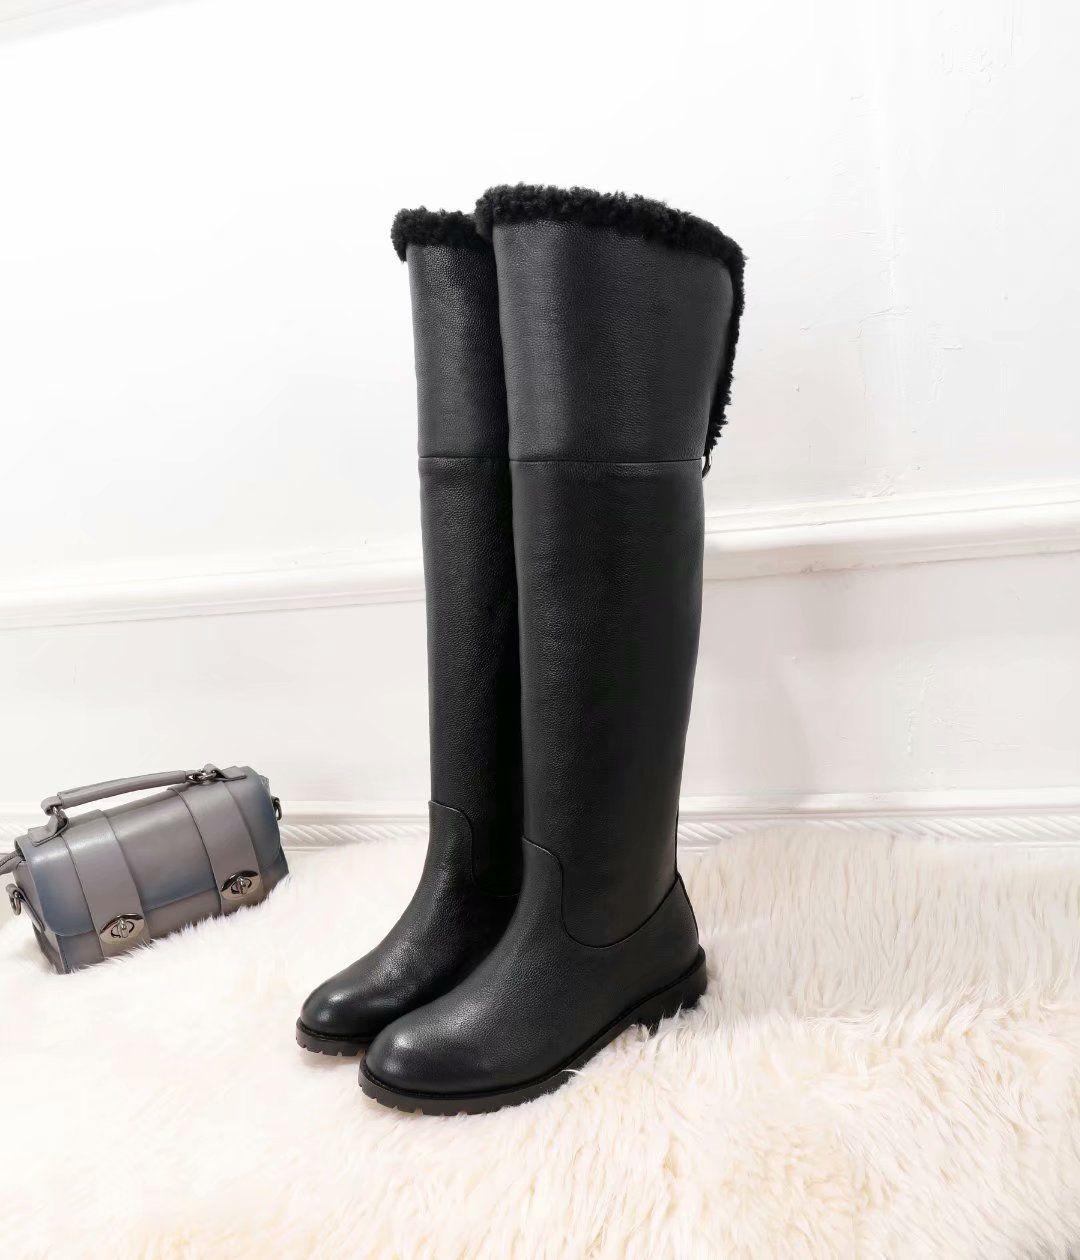 c6afe549d0e Compre Moda Caliente Invierno Forro De Piel Negro Muslo Botas Altas Mujeres  Tacón Plano Señoras De Invierno Botas Cálidas De Invierno Moto Zapatos A   205.28 ...